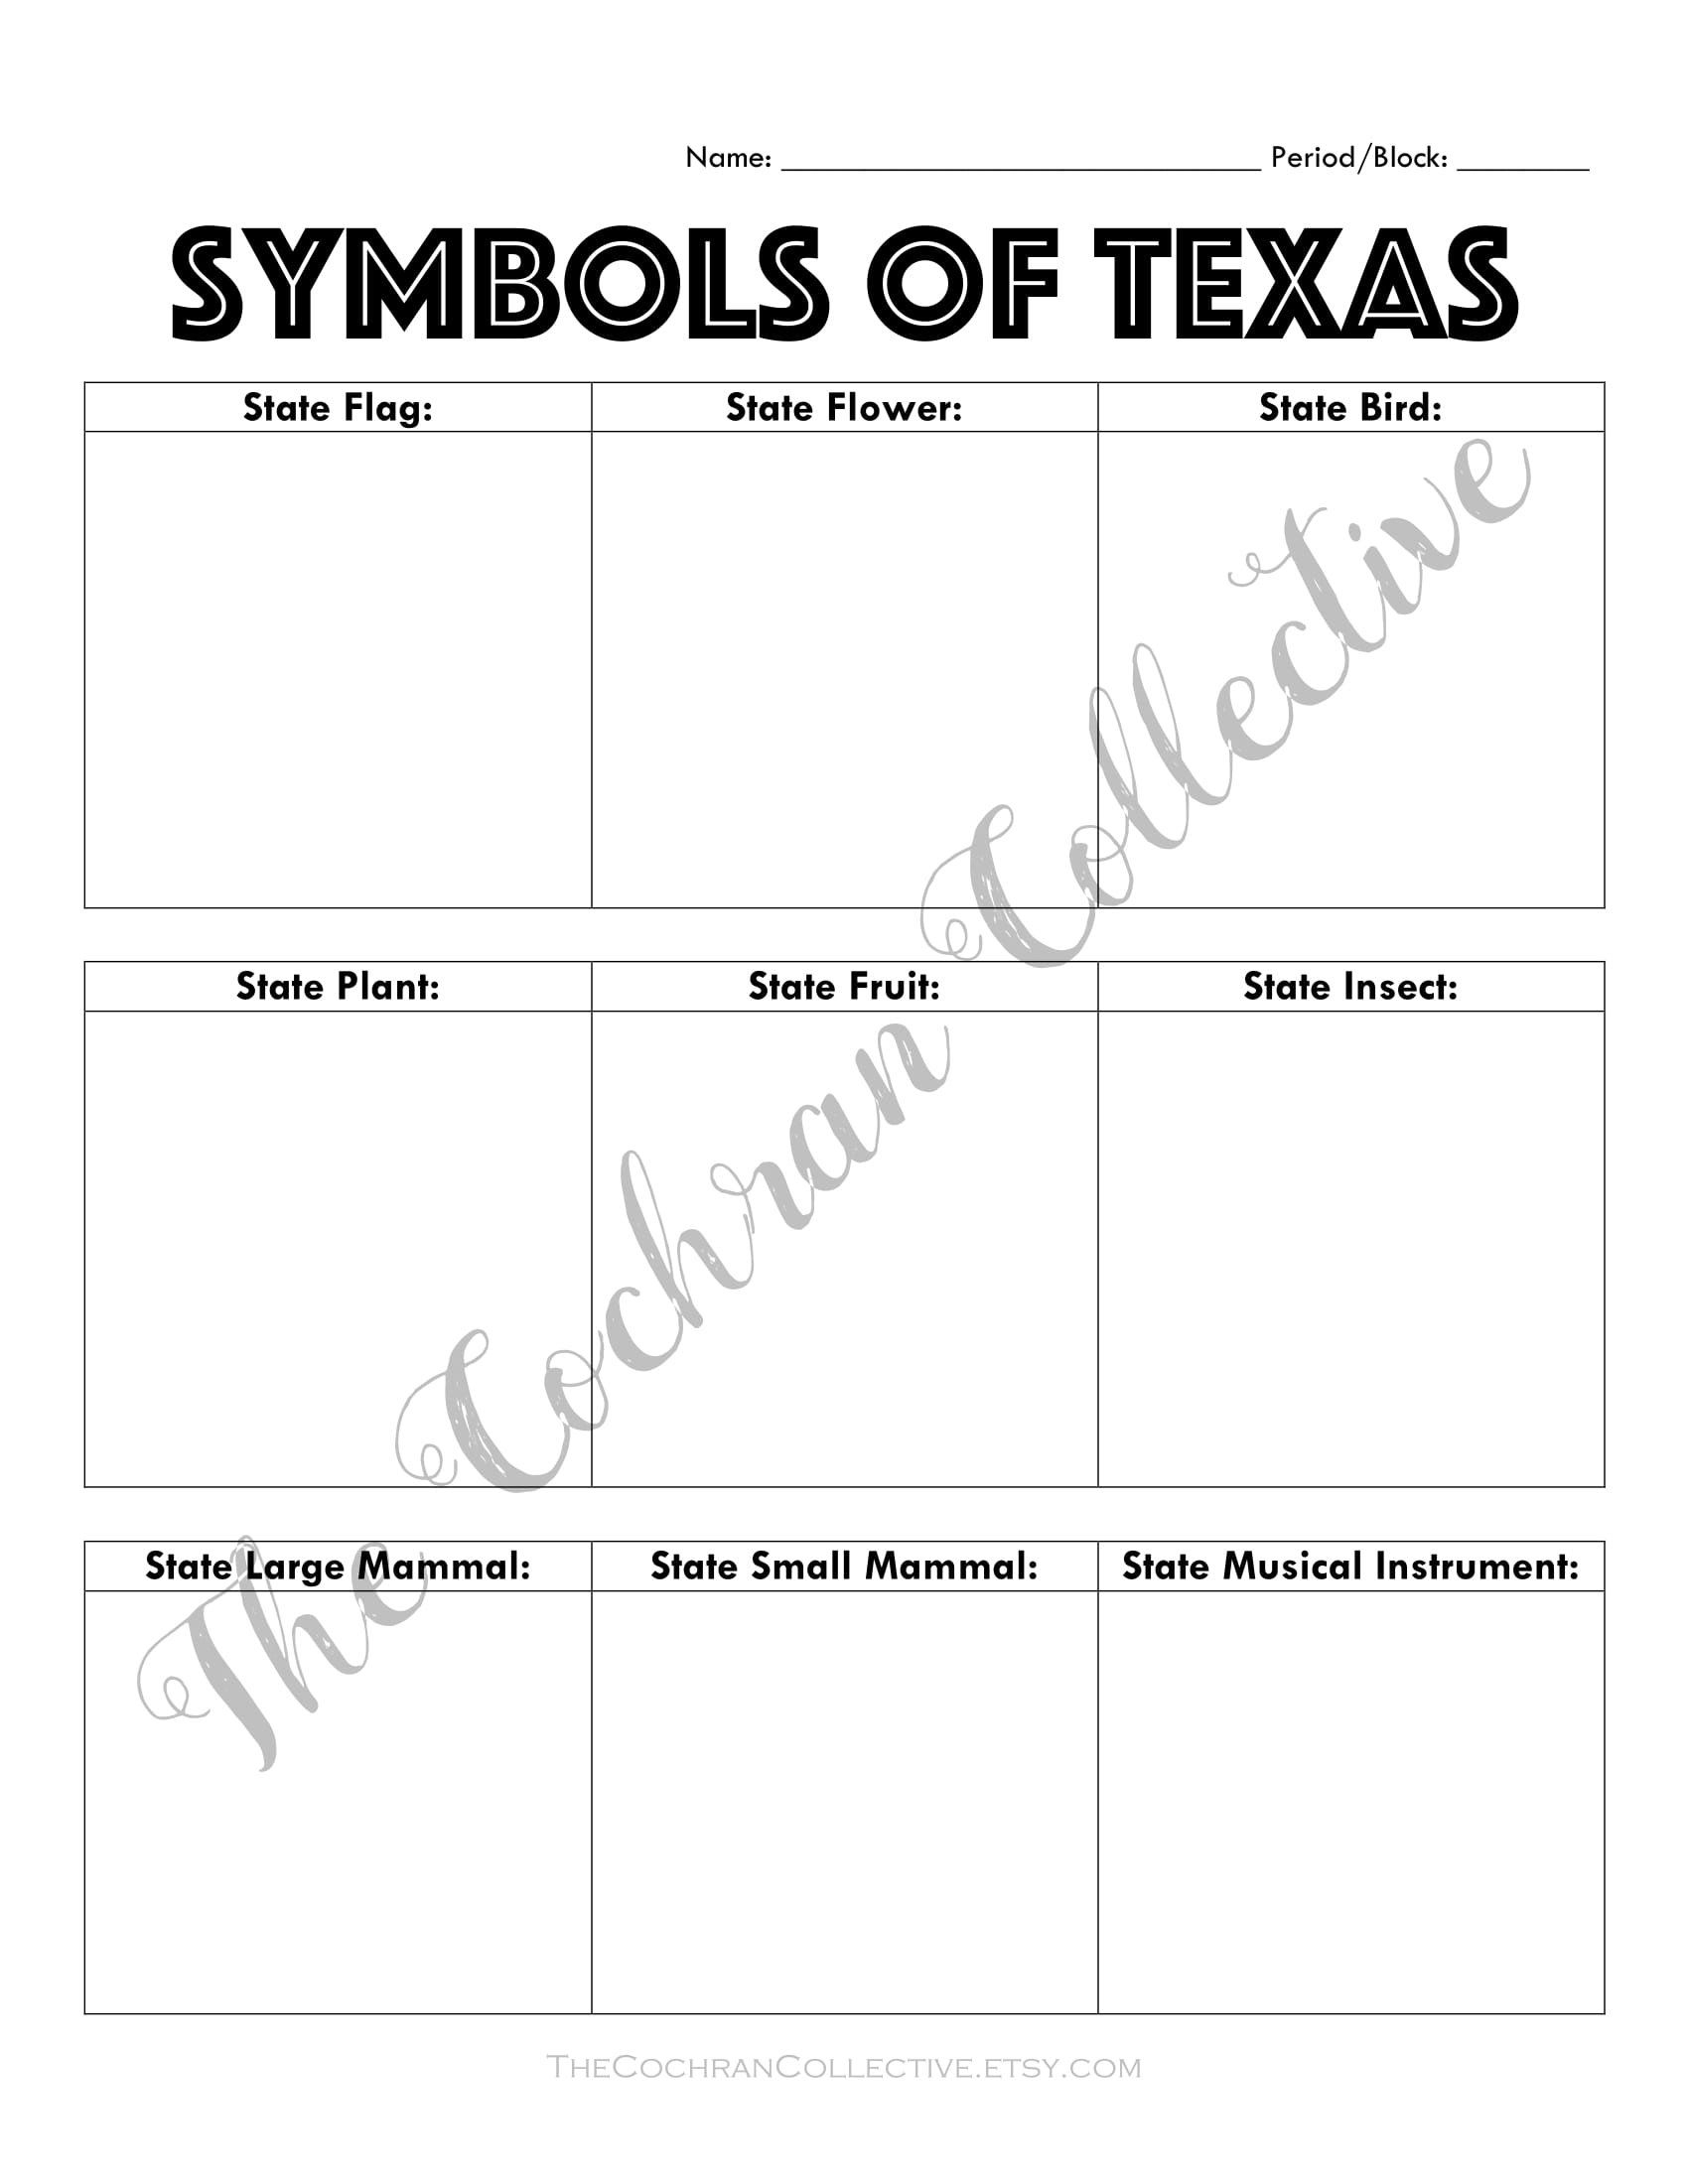 Texas State Symbols Worksheet Printable- Texas History - Texas | Texas History Worksheets Printable